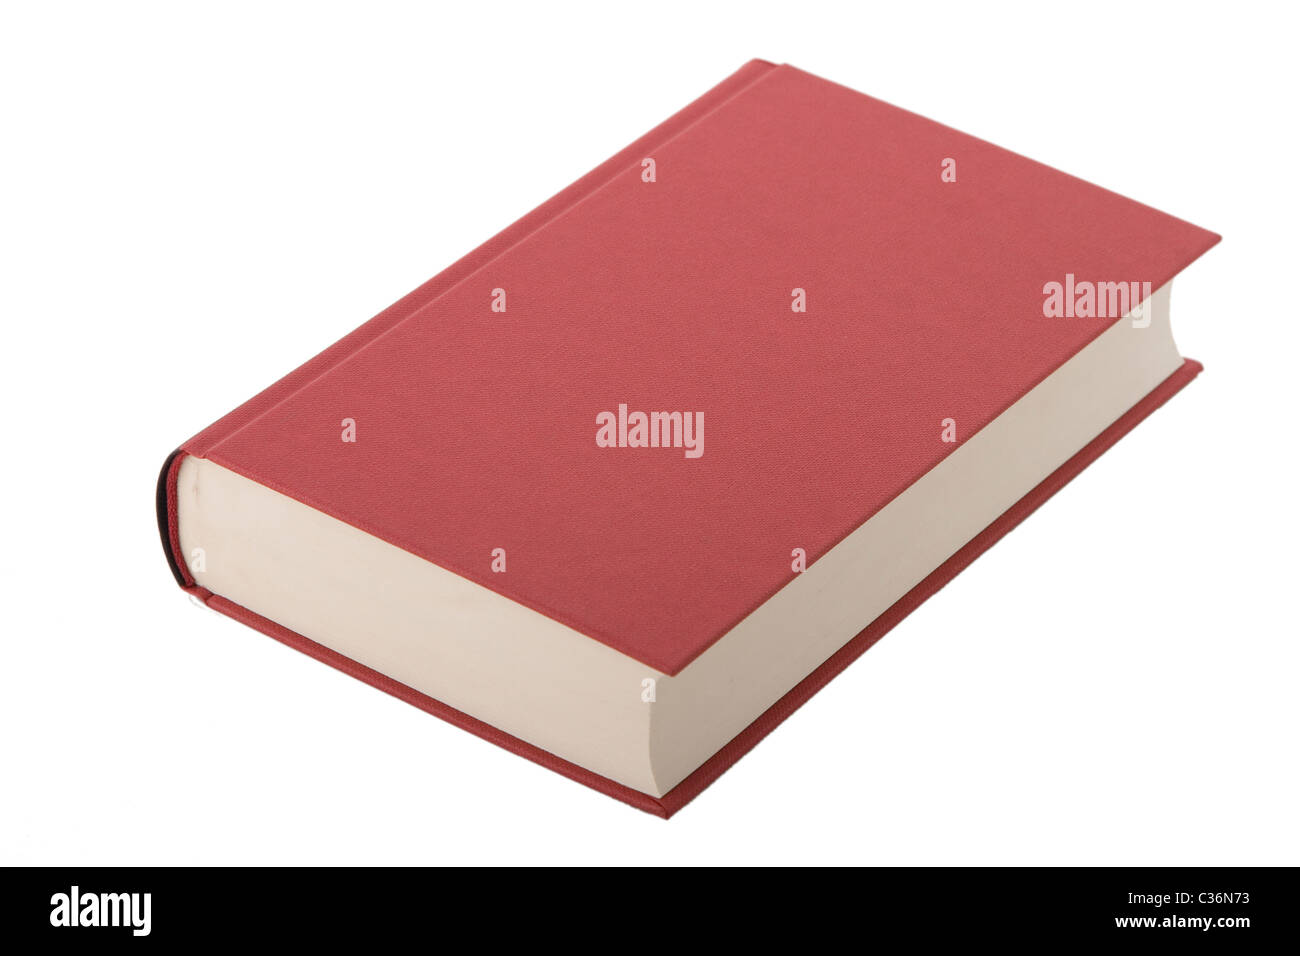 Nuevo libro de tapa dura roja con tapa. Imagen De Stock